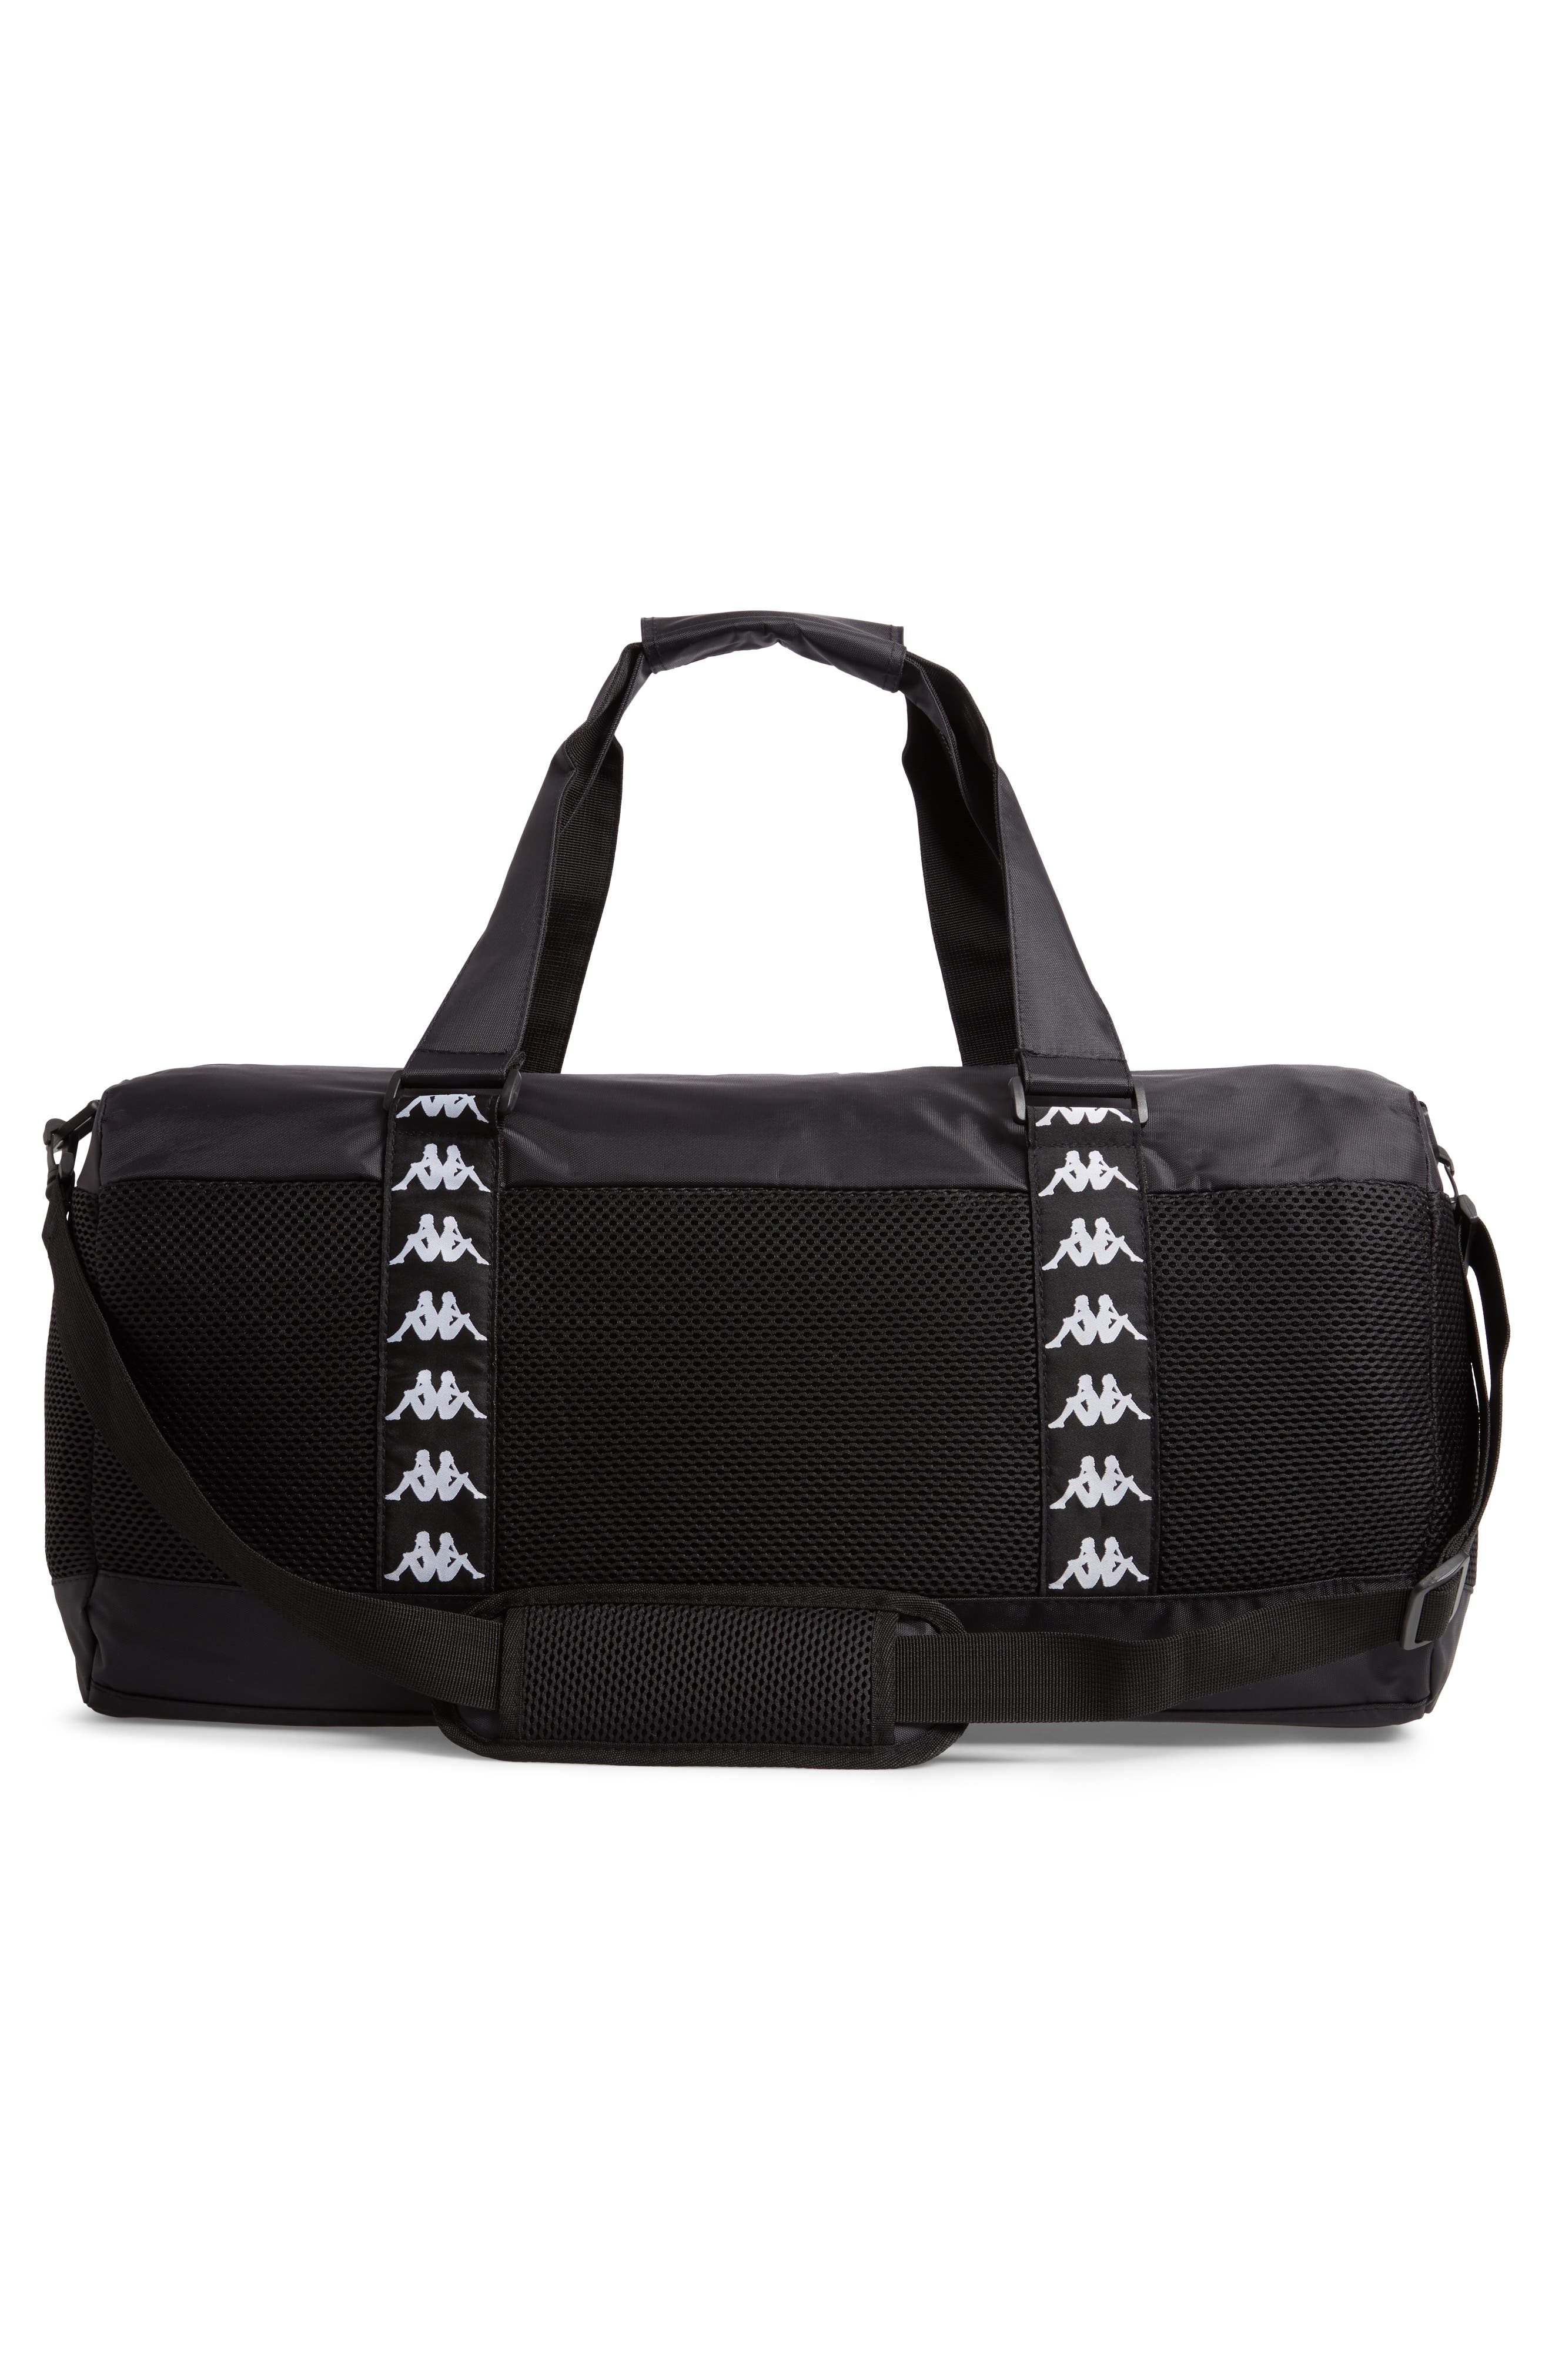 XL Athletic Duffel Bag,                             Alternate thumbnail 3, color,                             BLACK-WHITE